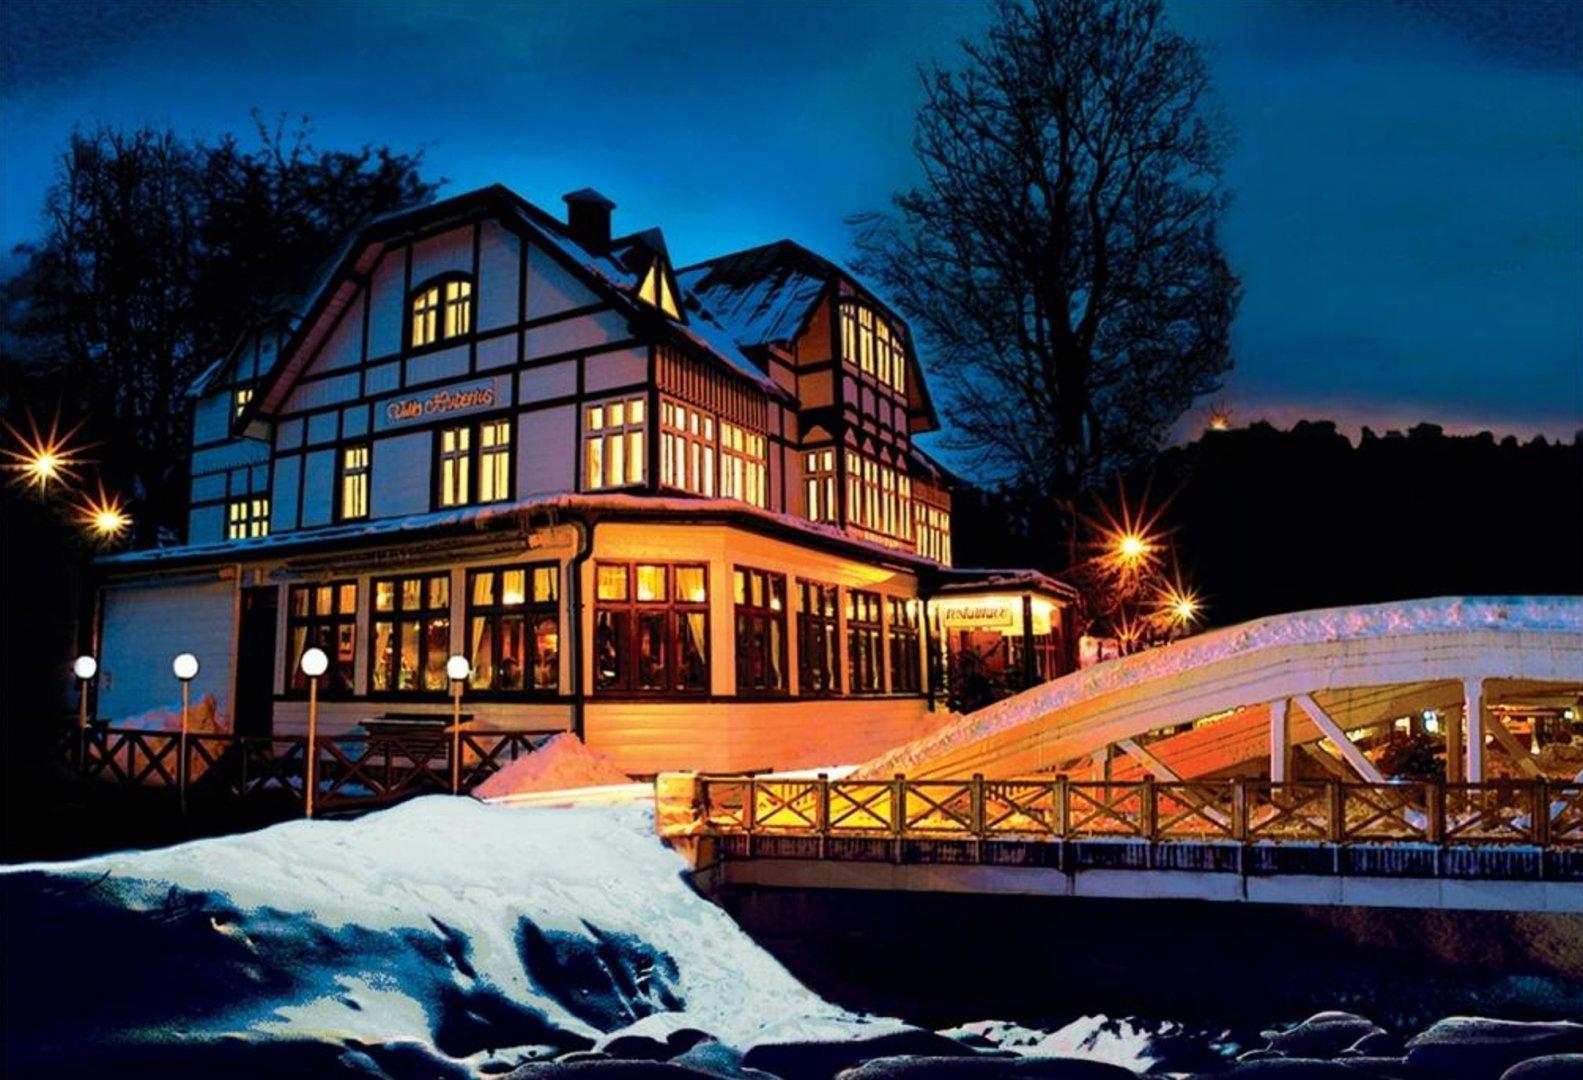 Hotel Villa Hubertus